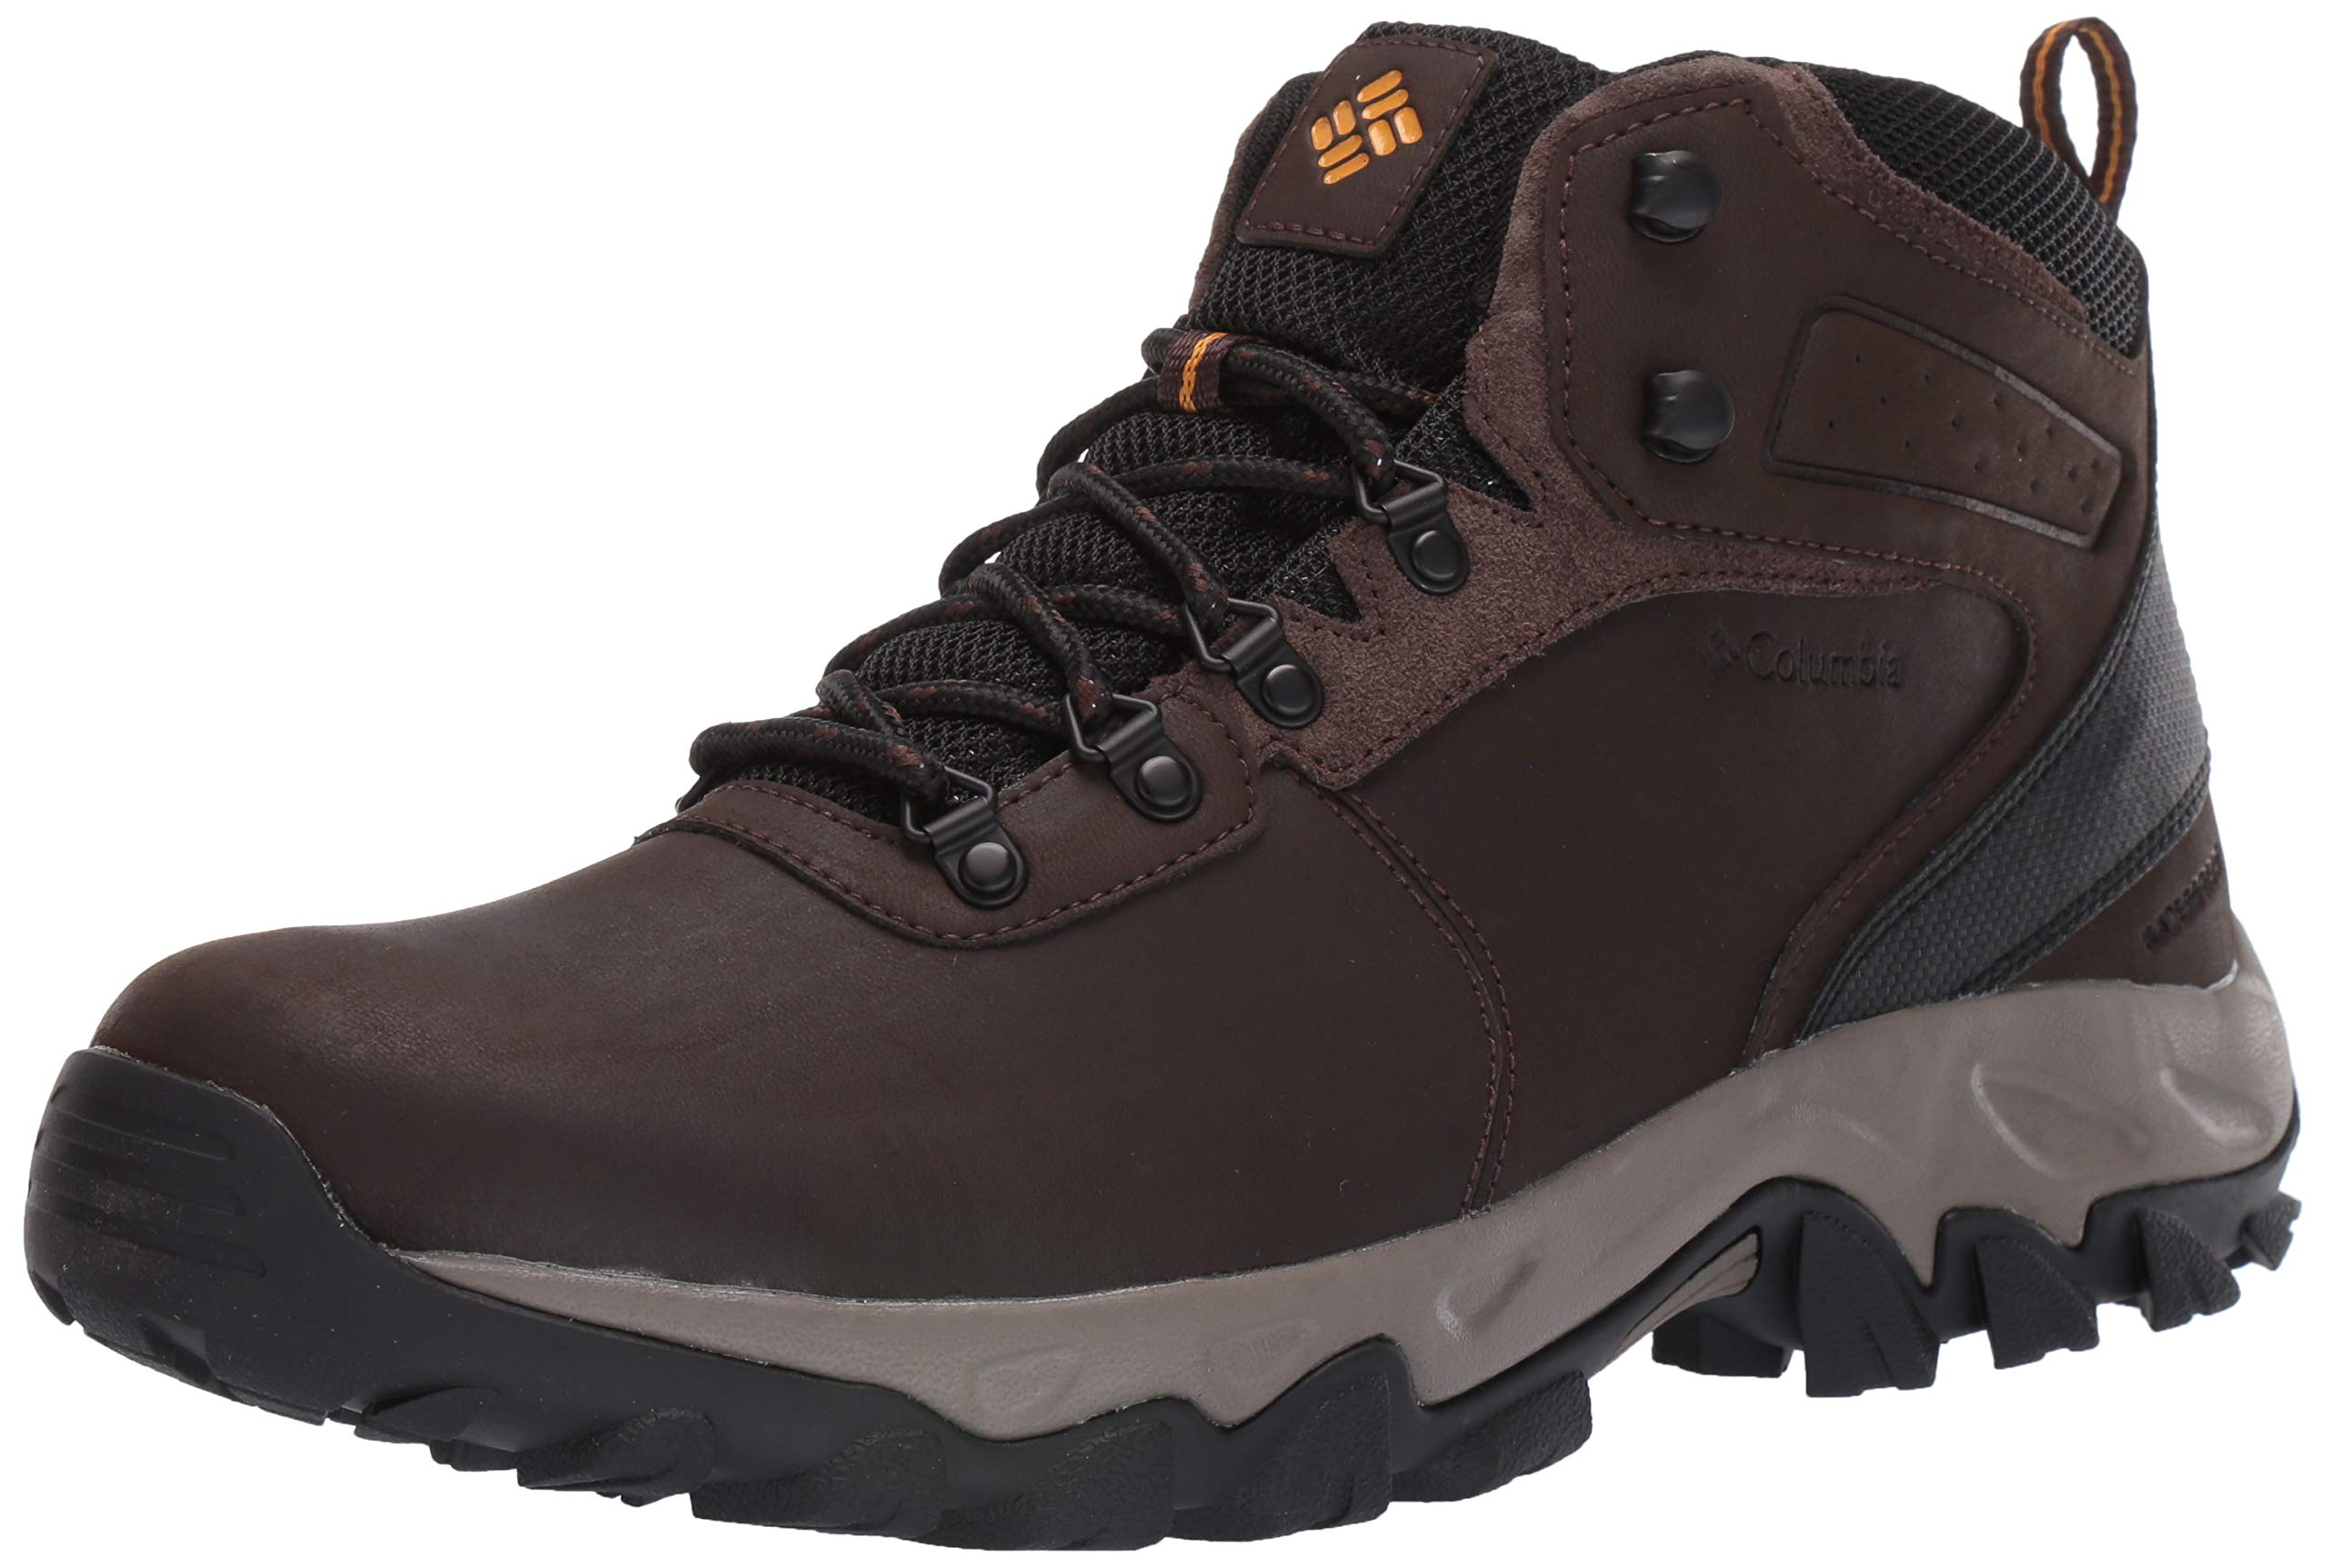 Columbia Men's Newton Ridge Plus II Waterproof Hiking Boot, Cordovan, Squash, 7 Regular US